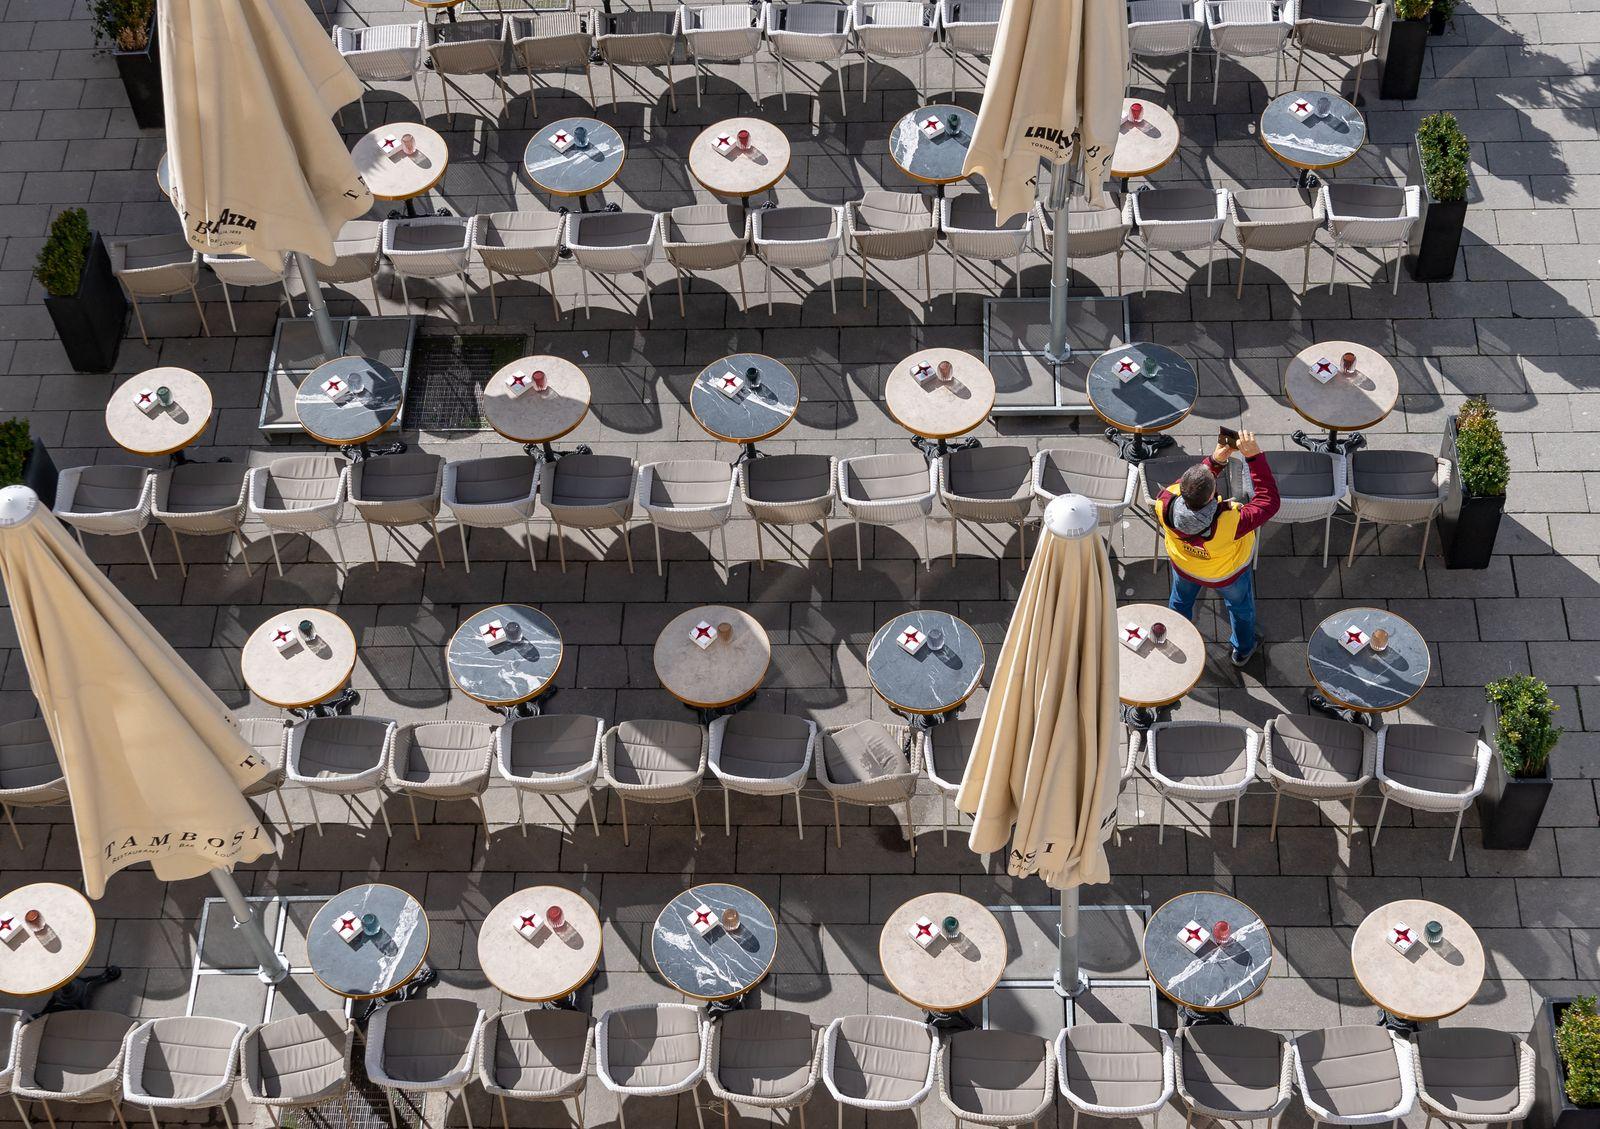 Leere Plätze durch Corona-Krise